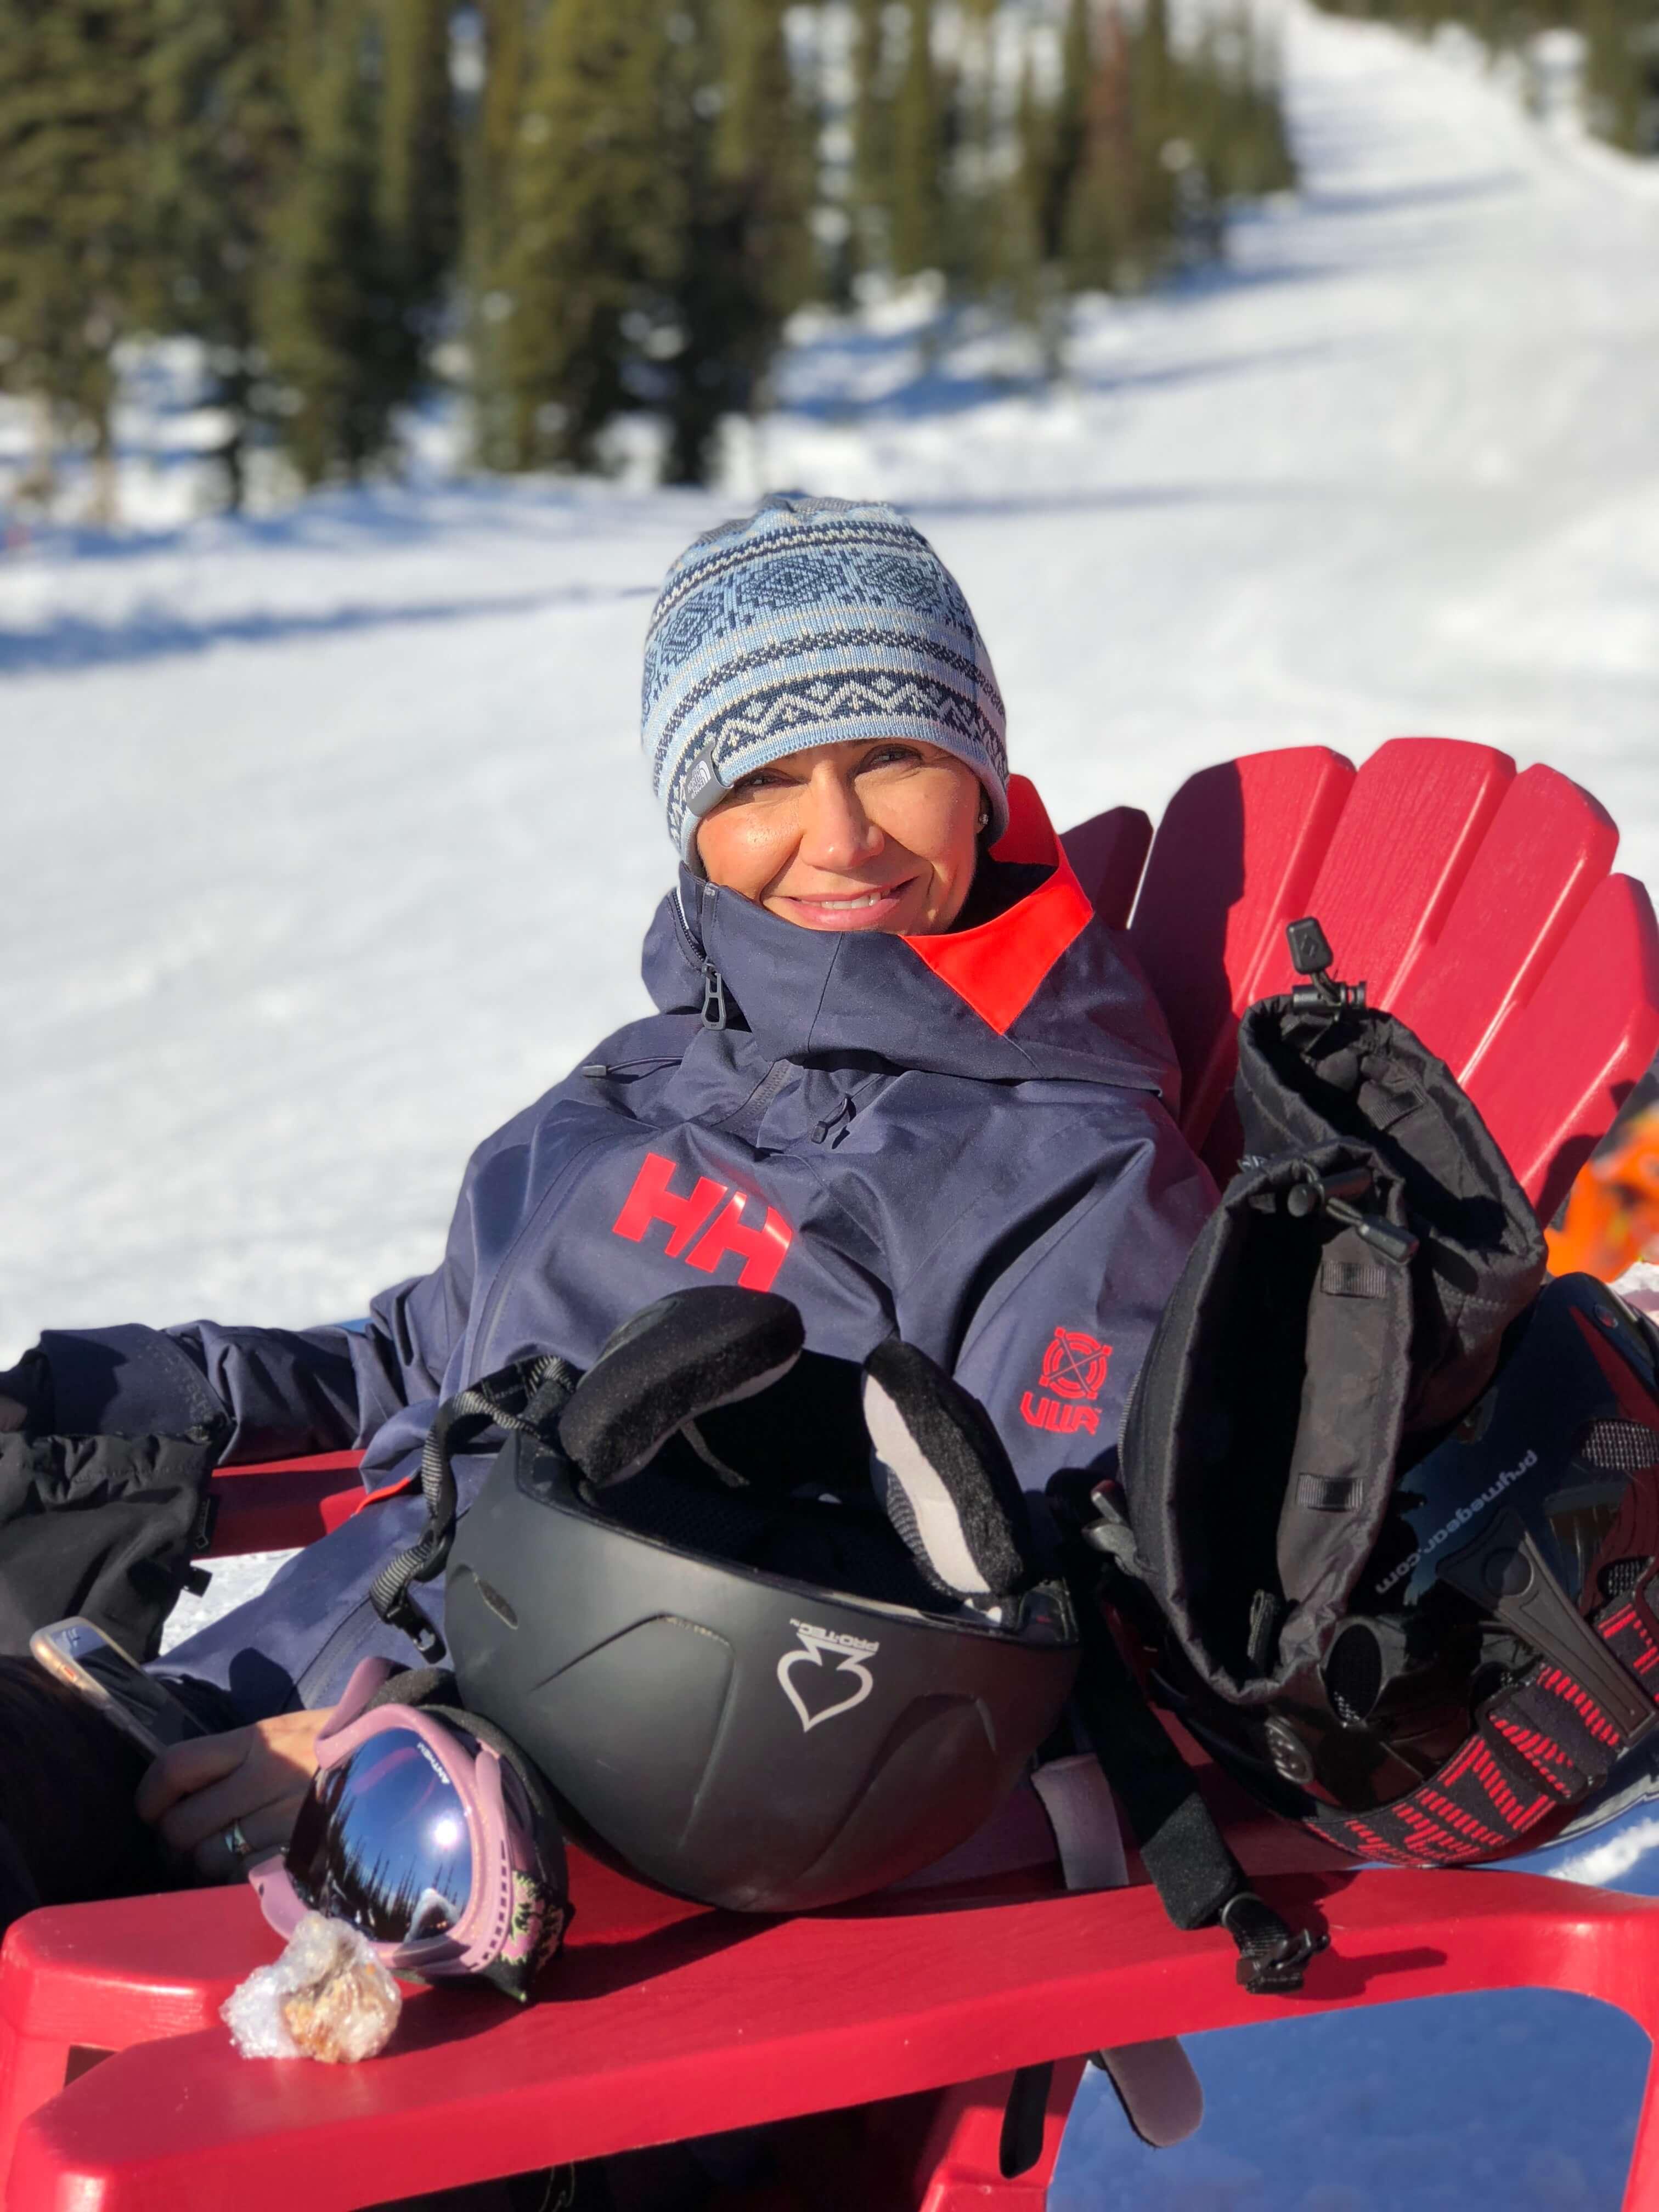 downhill skiing - woman